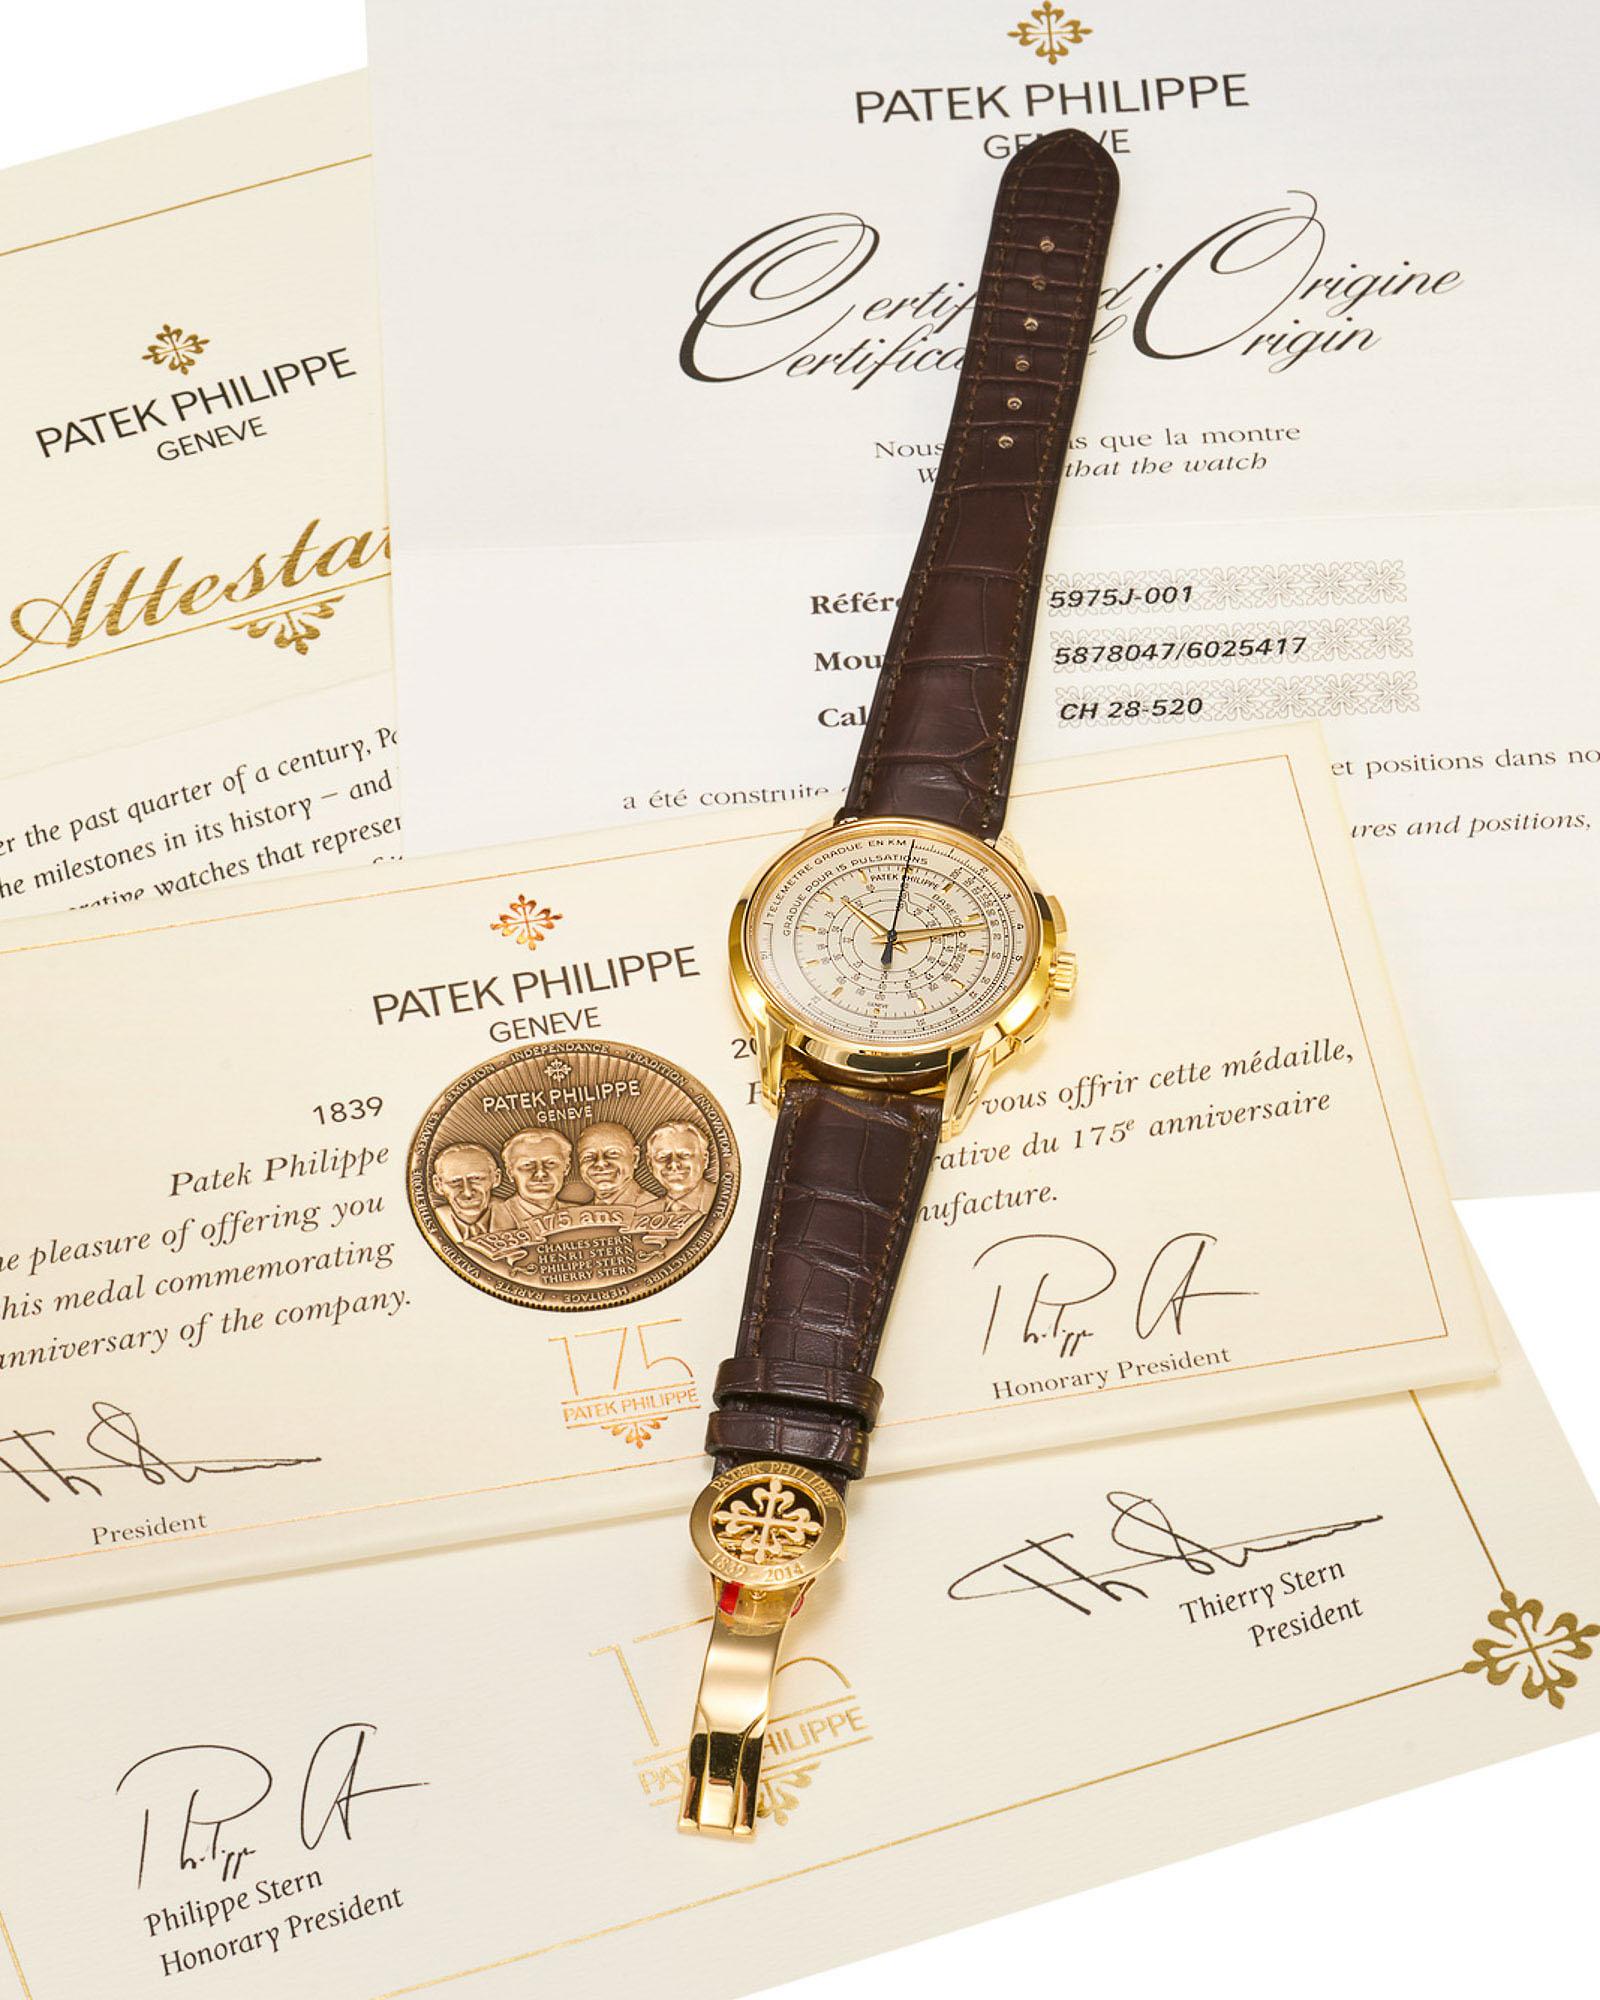 Antiquorum Auction May 2020 Patek Philippe Ref. 5975J Chronograph 175th Anniversary